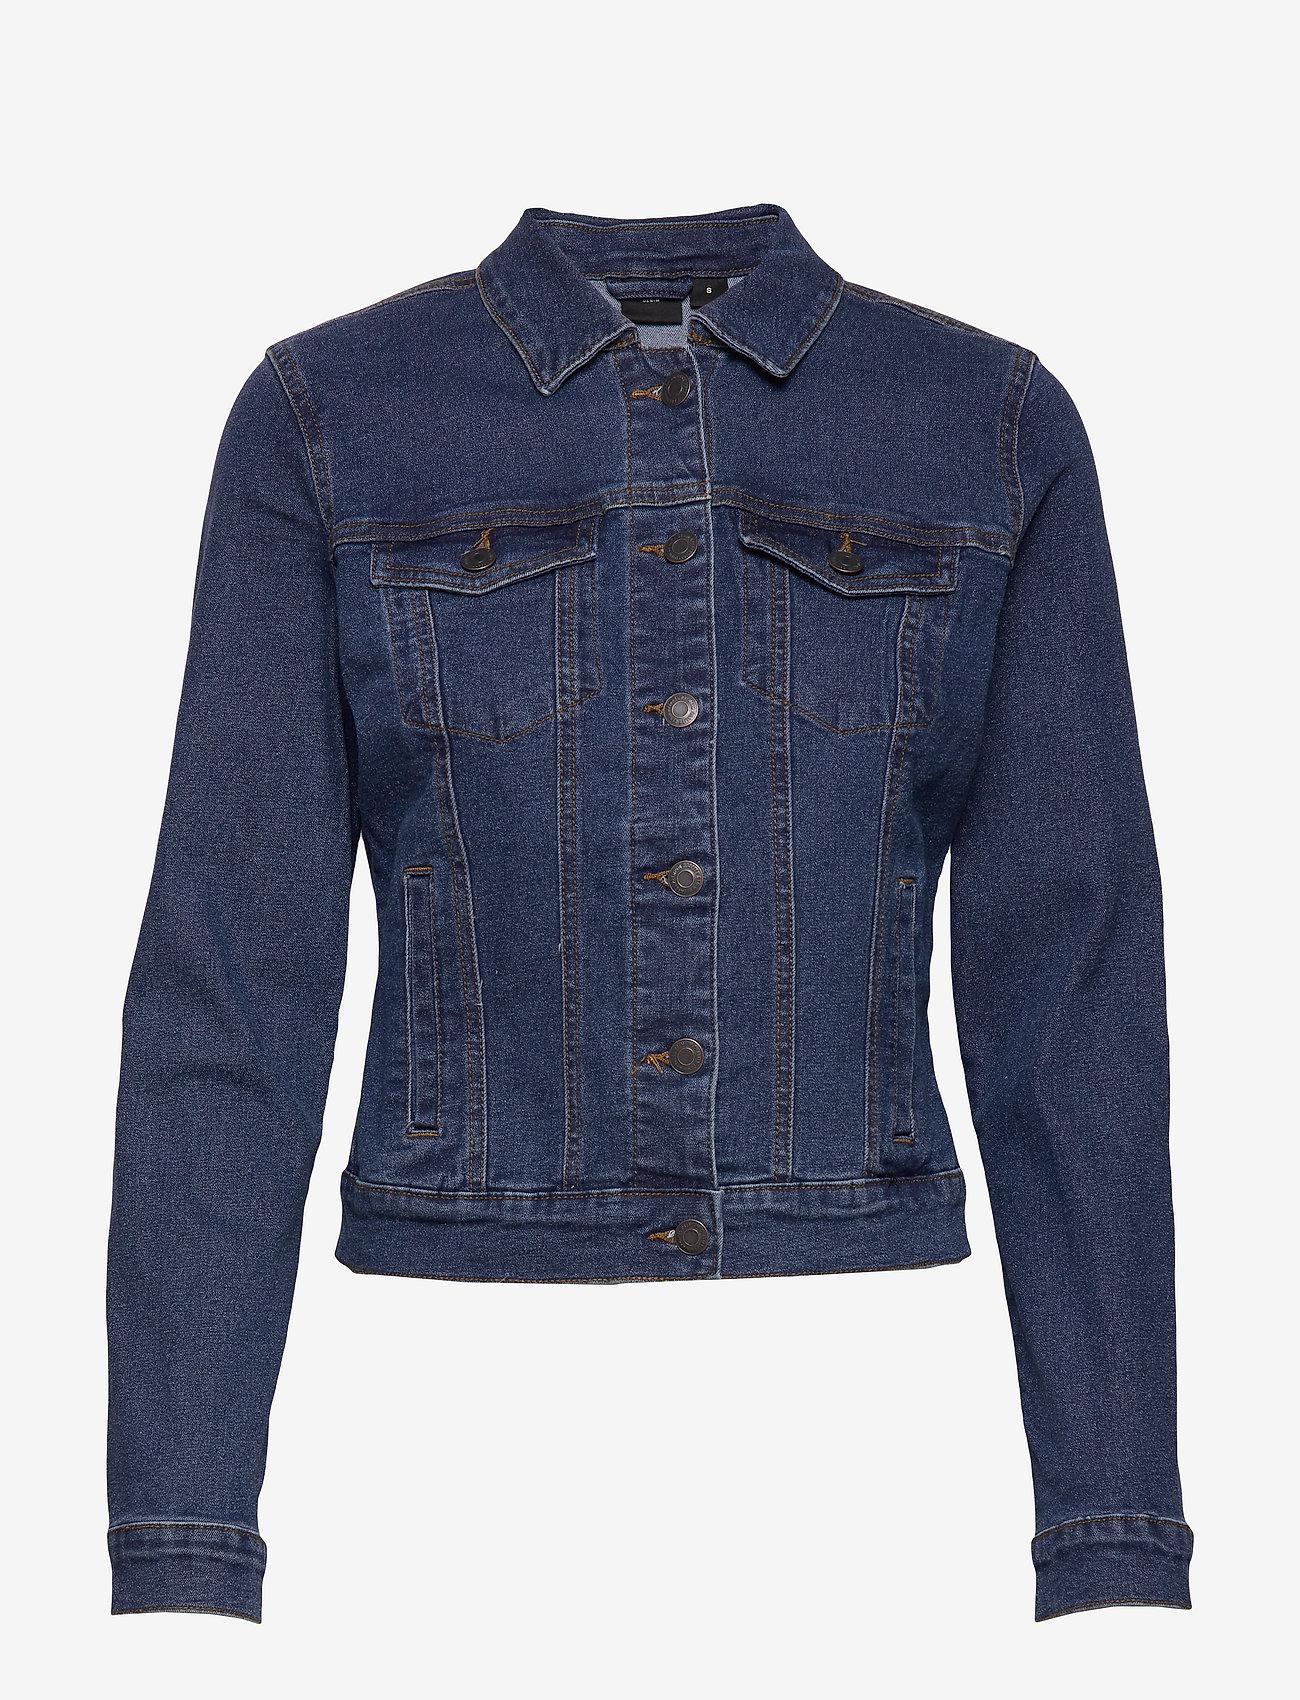 Vero Moda - VMHOT SOYA LS DENIM JACKET MIX GA - jeansjackor - medium blue denim - 0